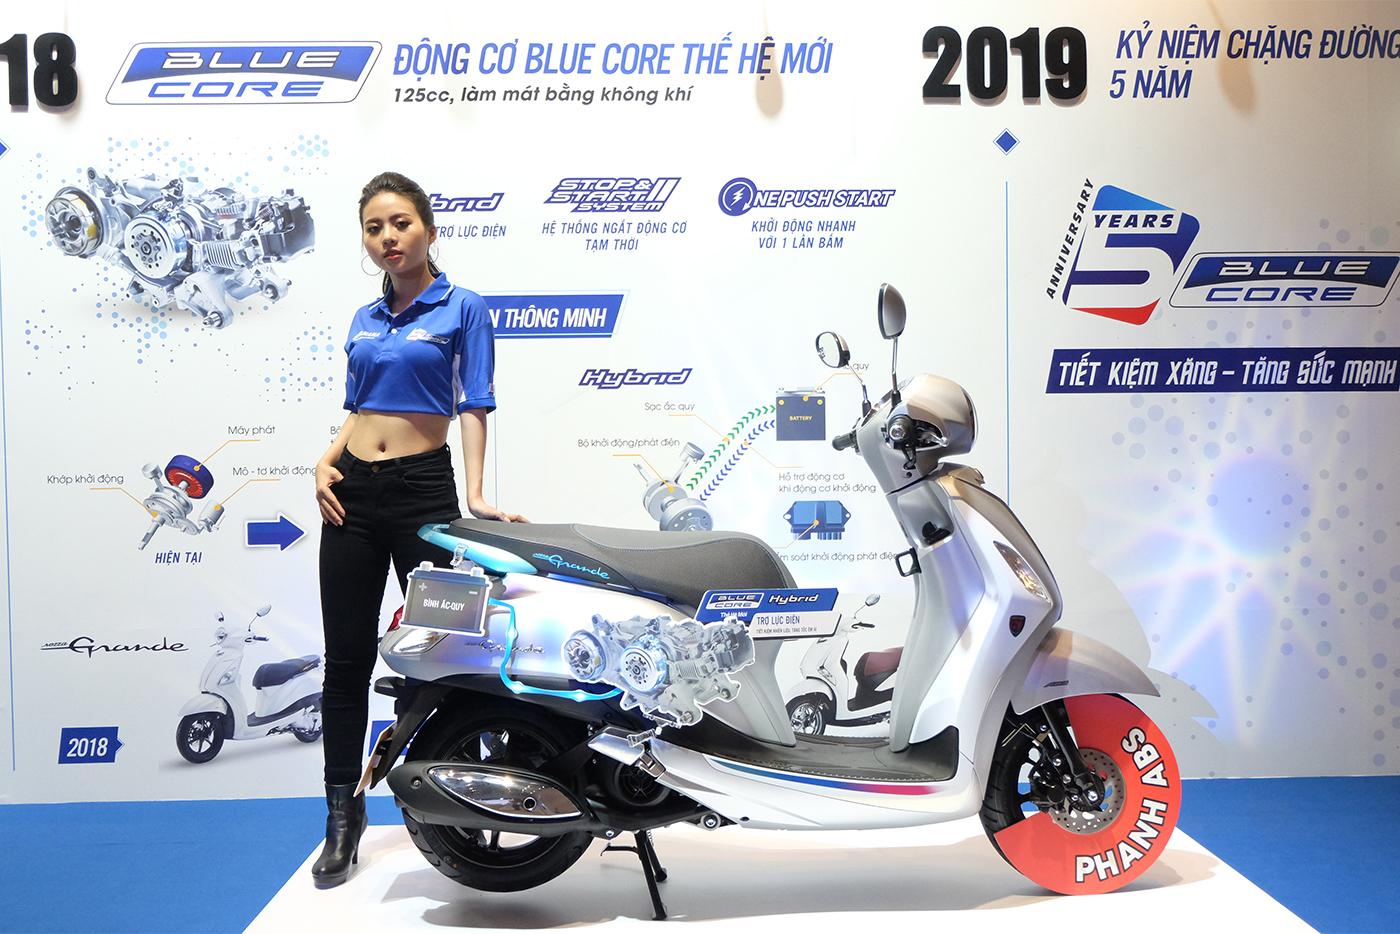 yamaha-motor-viet-nam-ky-niem-5-nam-dong-co-blue-core-va-hanh-trinh-asean-blue-core-touring-8.JPG